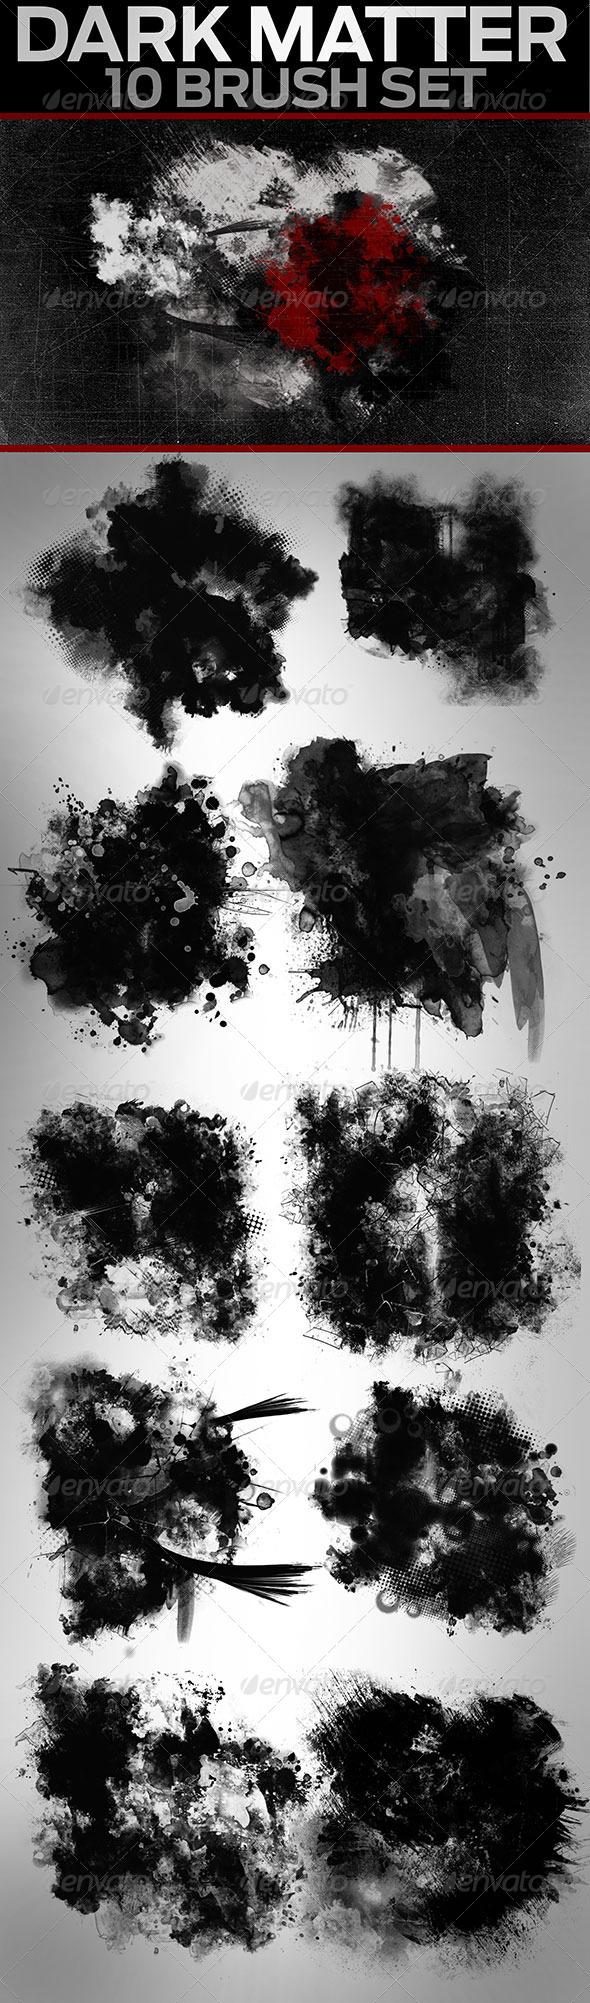 GraphicRiver 10 Hi-Res Grunge Brushes Dark Matter 7920030